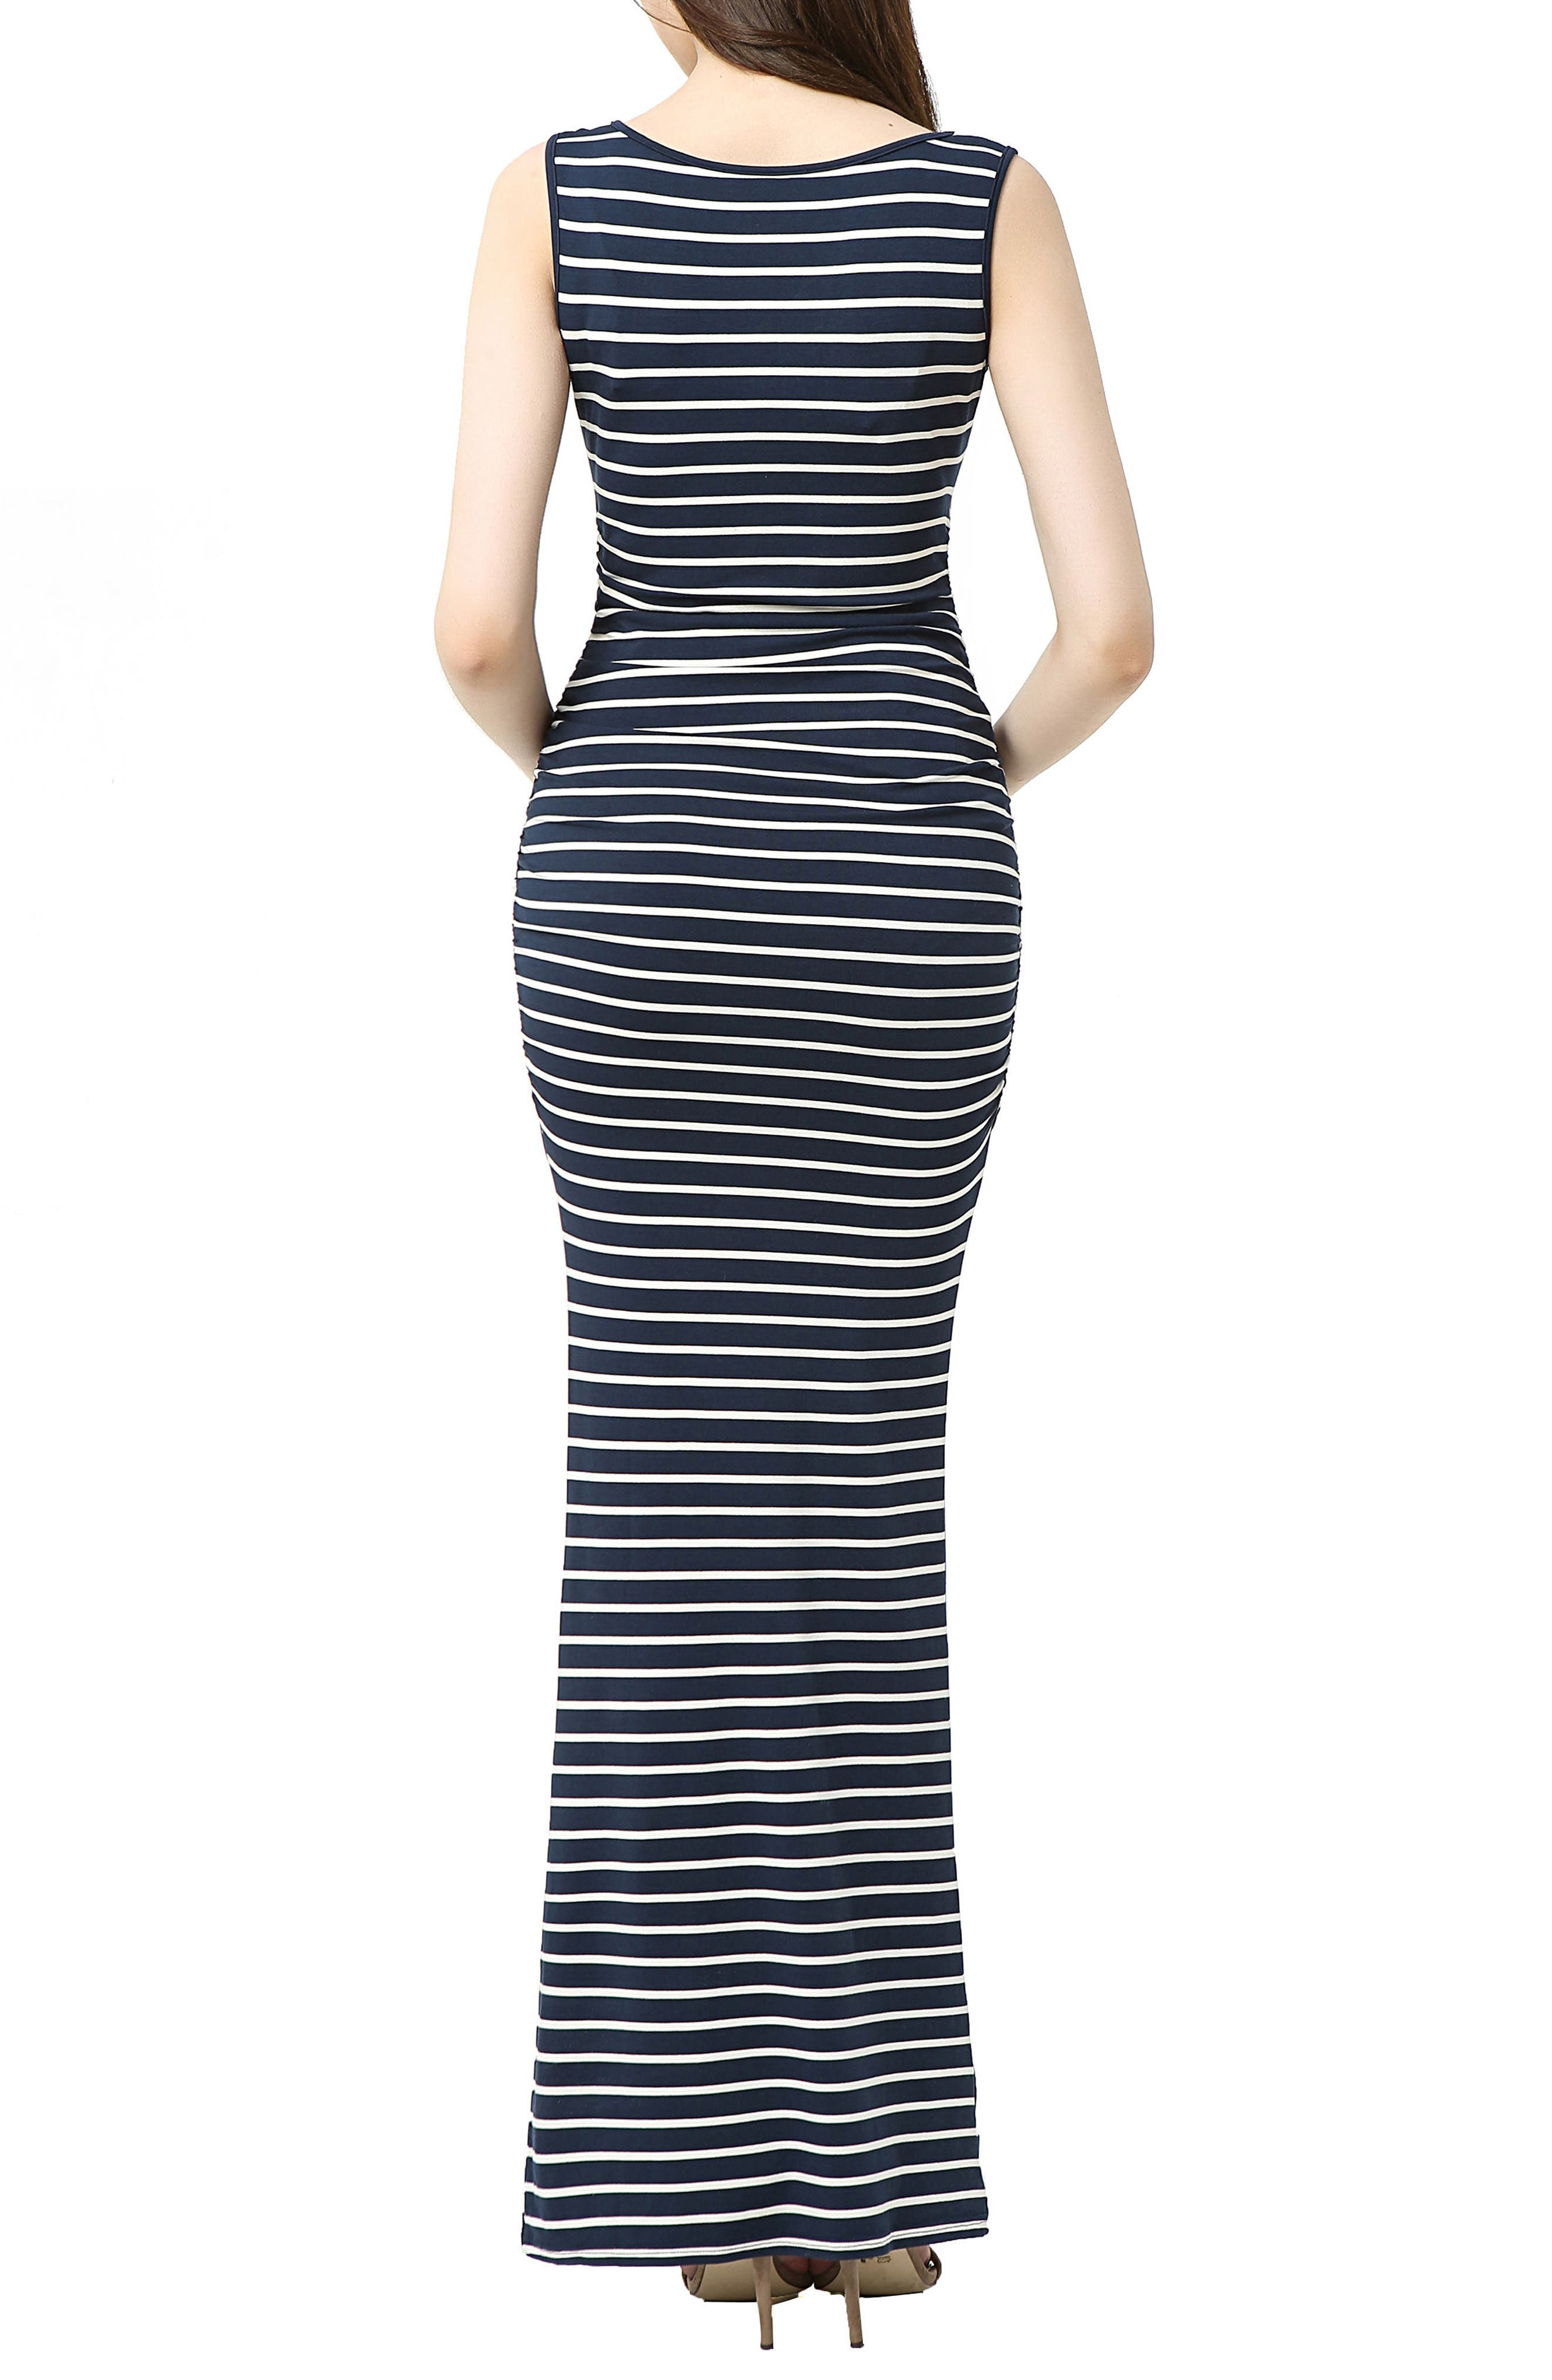 Peyton Stripe Maxi Maternity Dress,                             Alternate thumbnail 2, color,                             NAVY/ IVORY